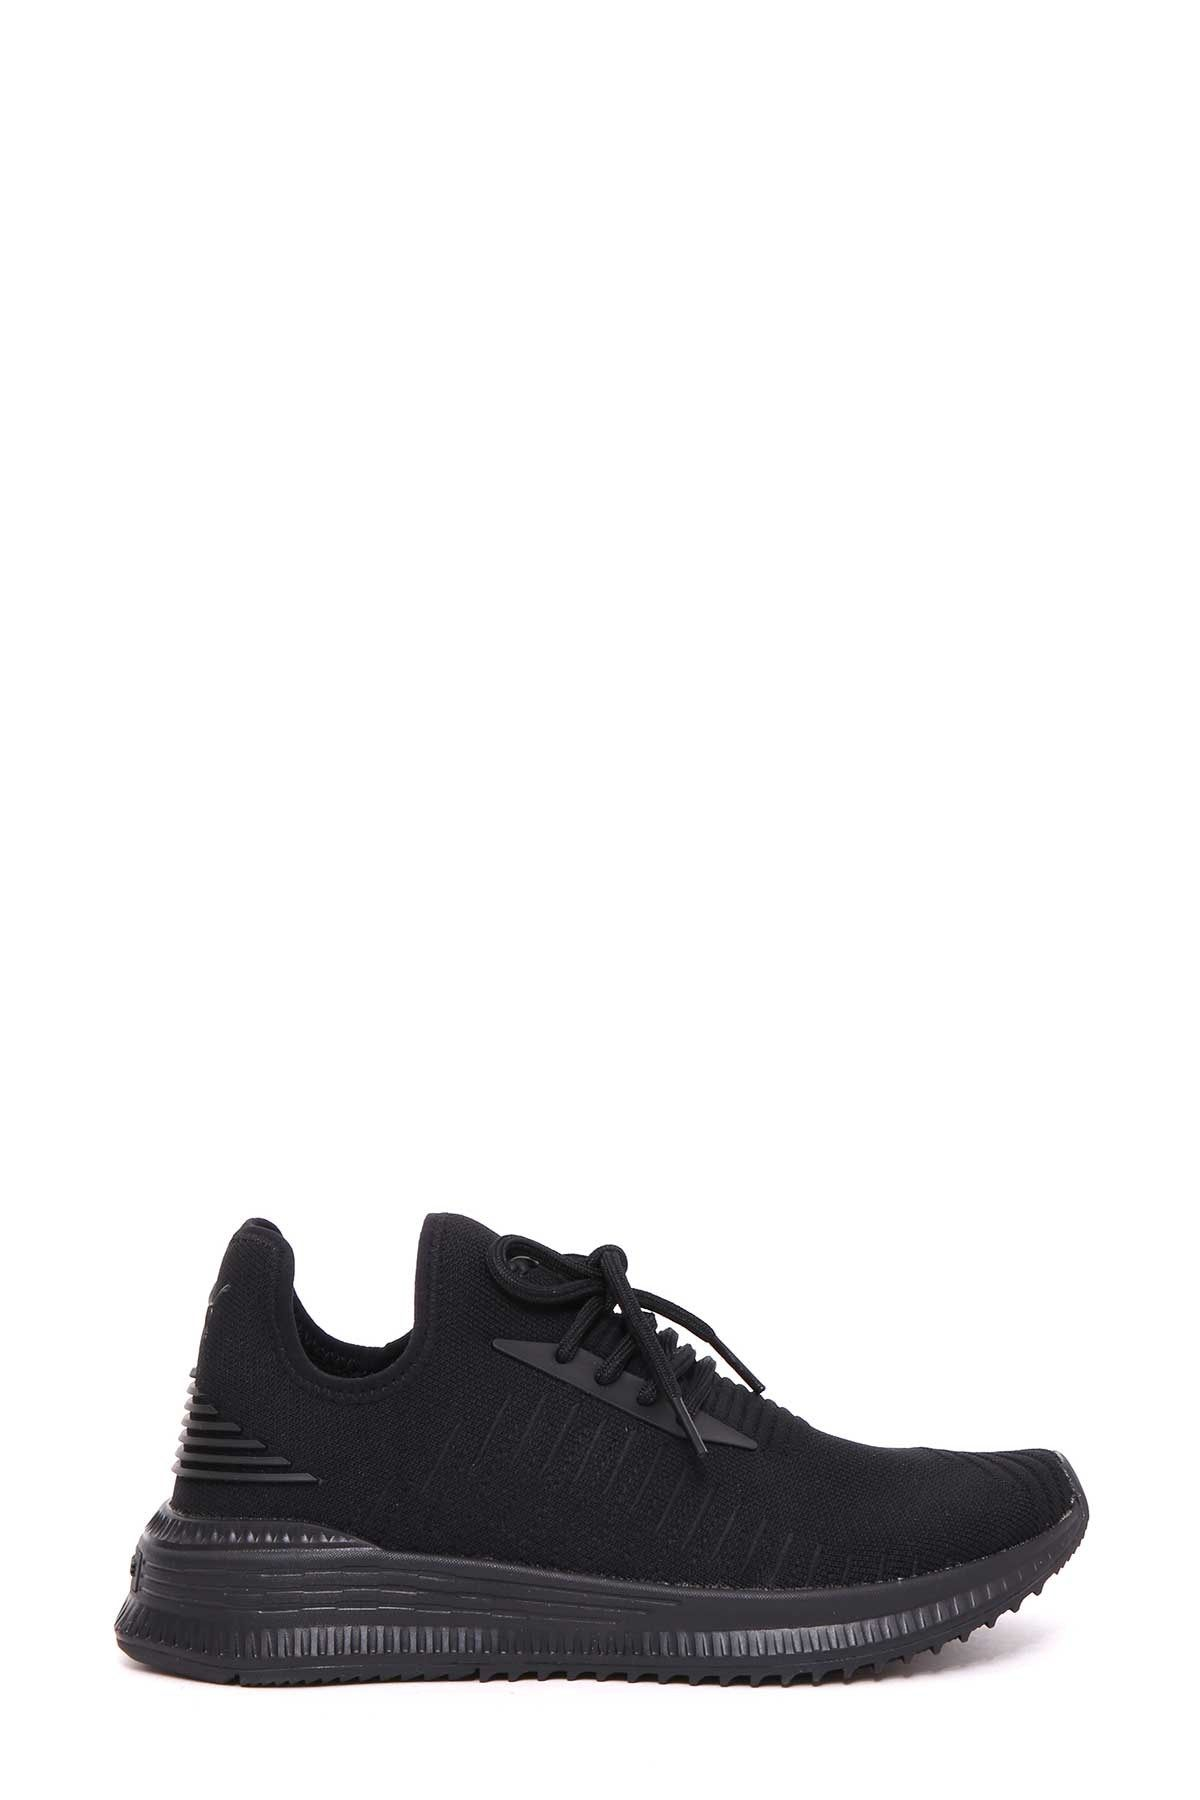 PUMA tsugi avid sneaker. #puma #shoes